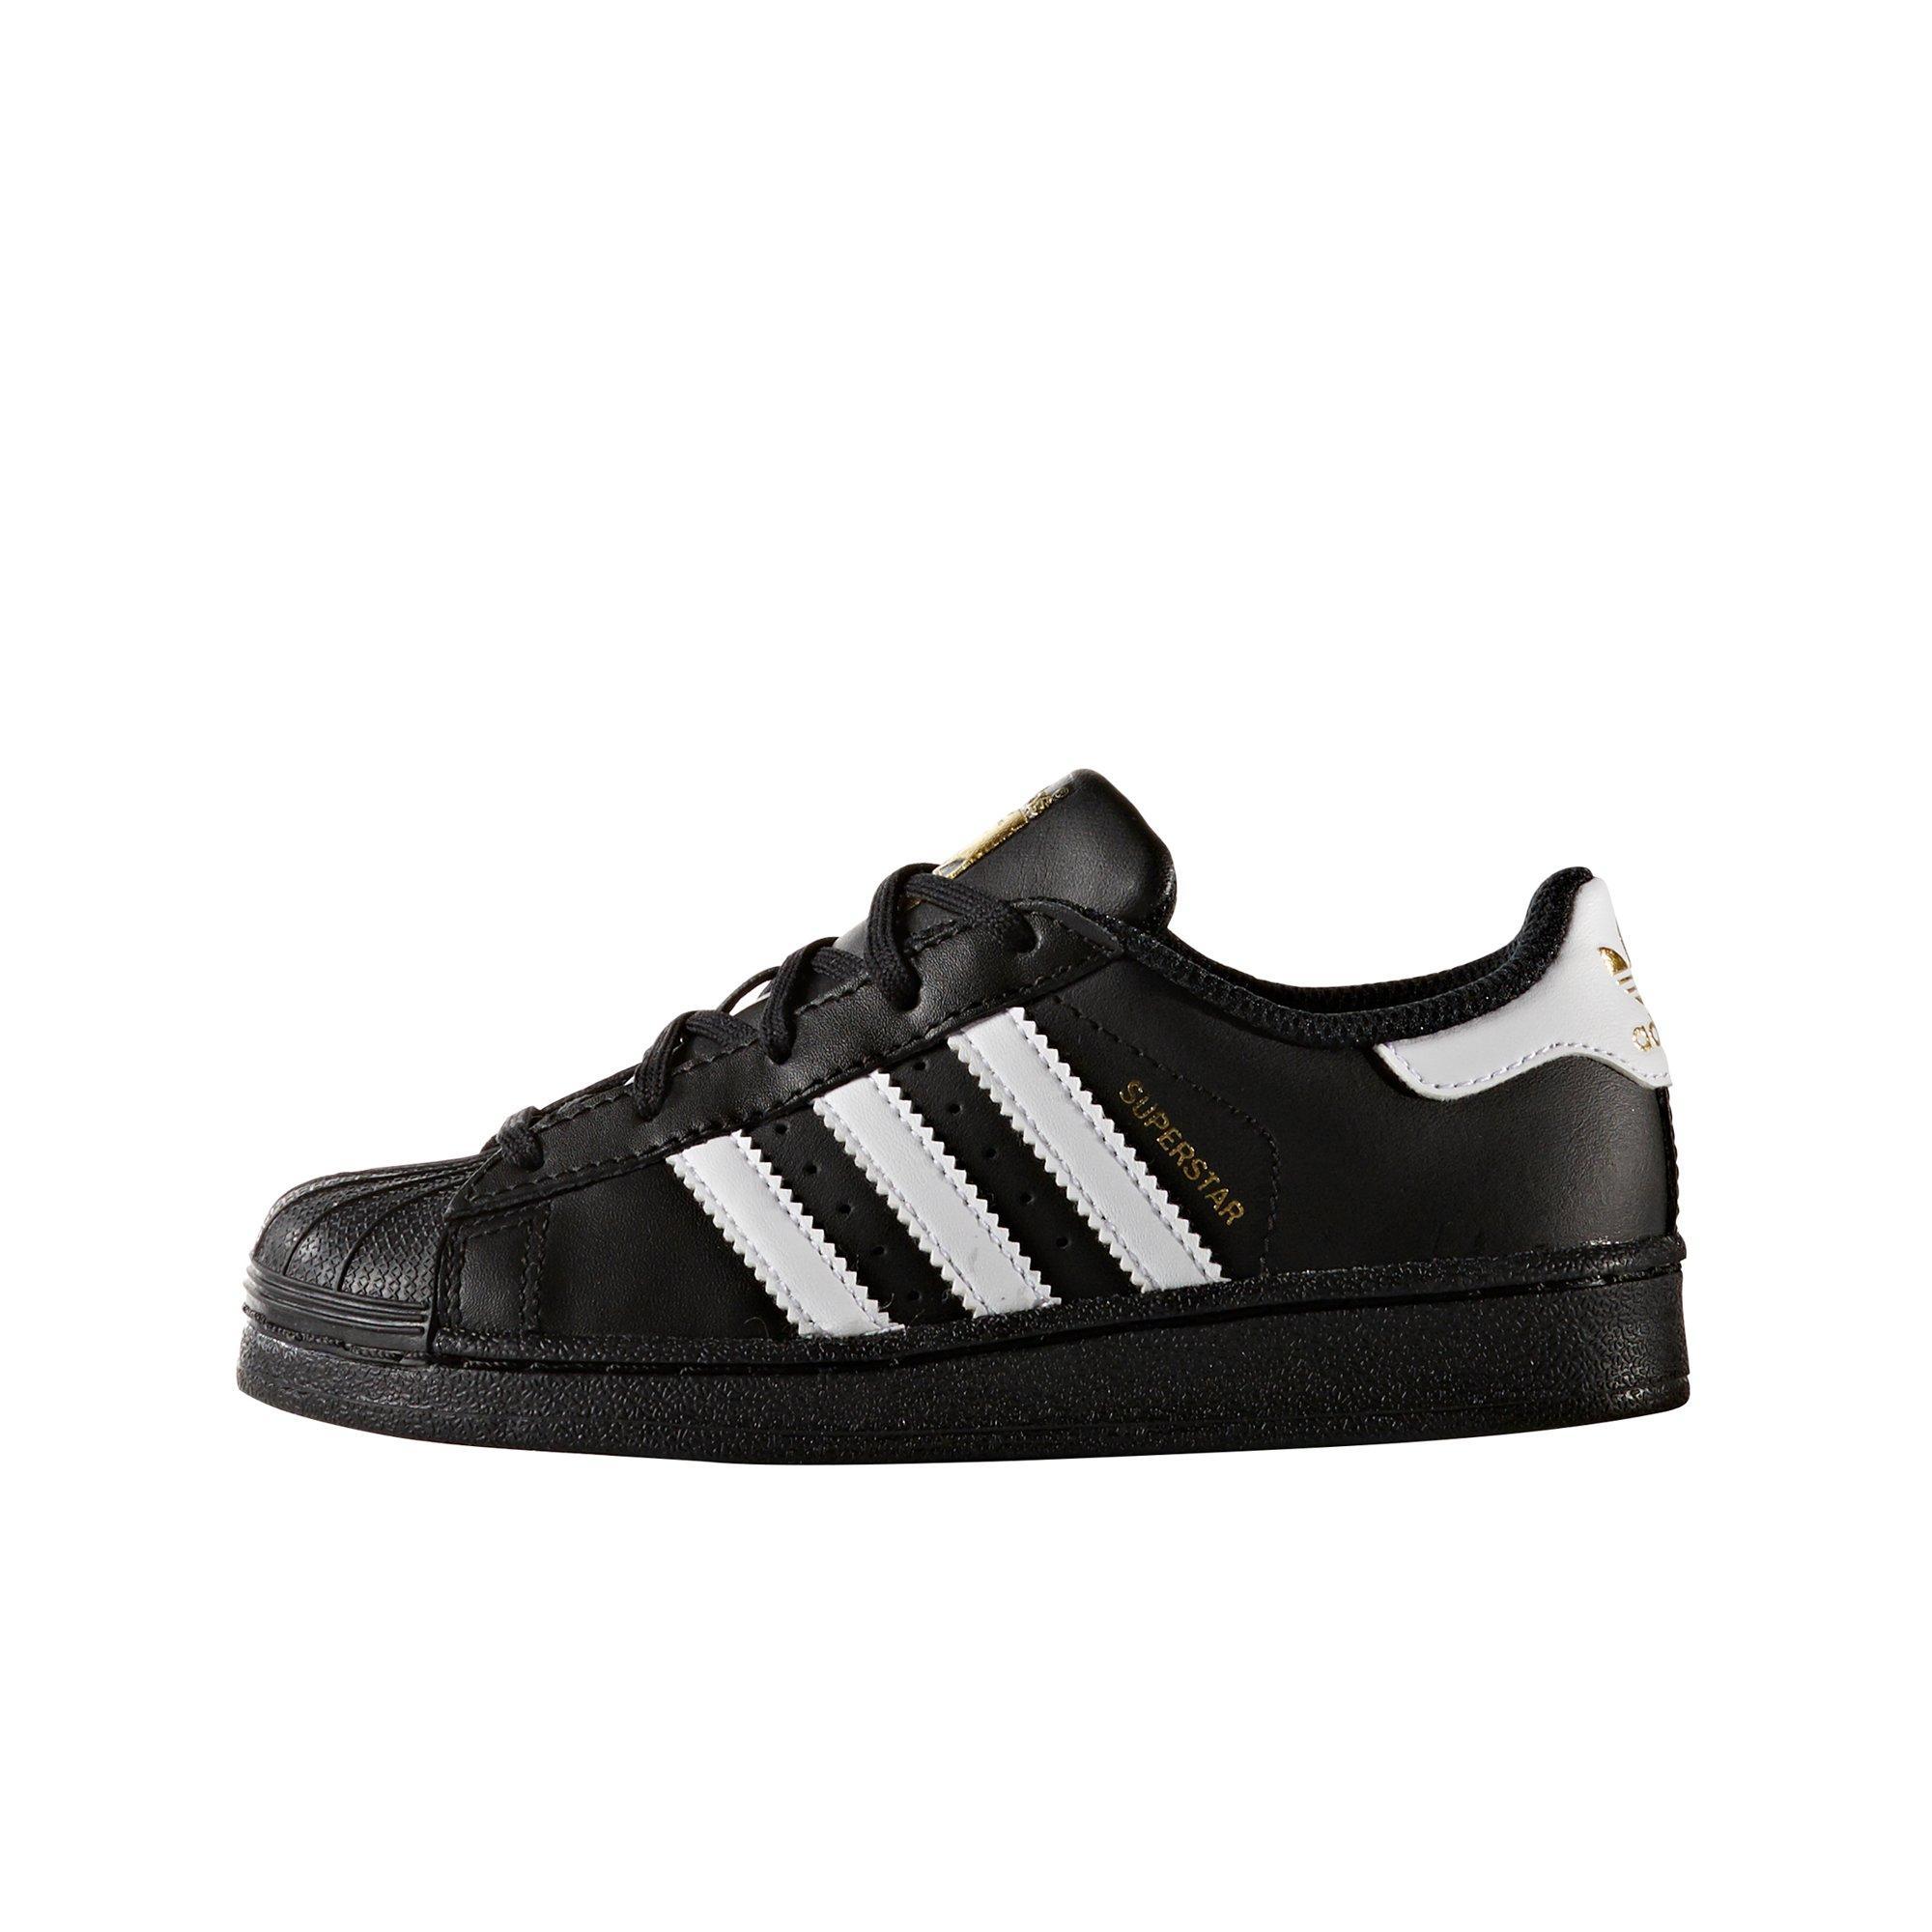 63153efaf9 adidas stan smith gold colors rgb adidas superstar shoes mens black ...